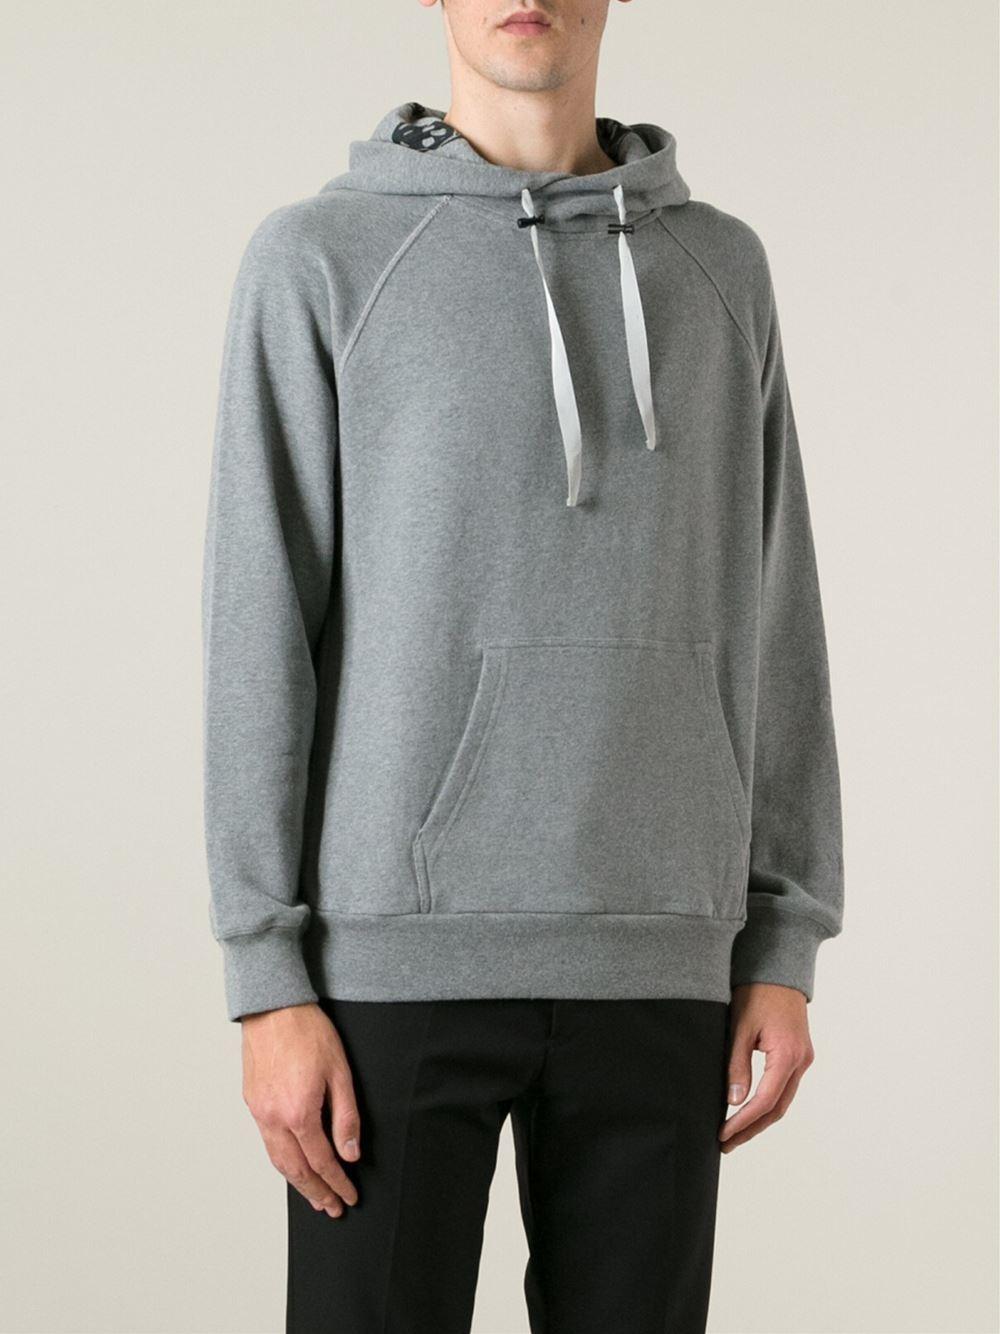 alexander mcqueen drawstring cotton hoodie in gray for men grey lyst. Black Bedroom Furniture Sets. Home Design Ideas